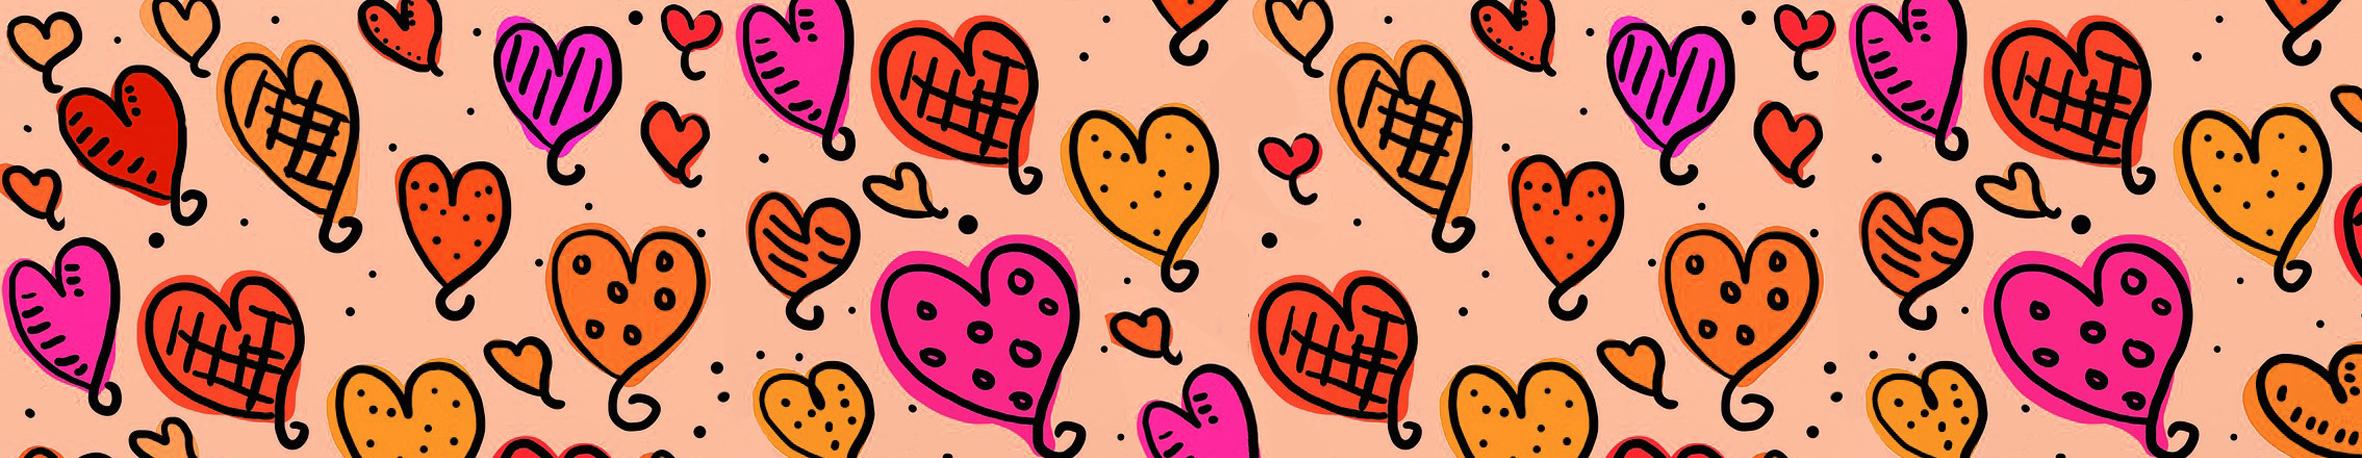 Avondje liefde top 1